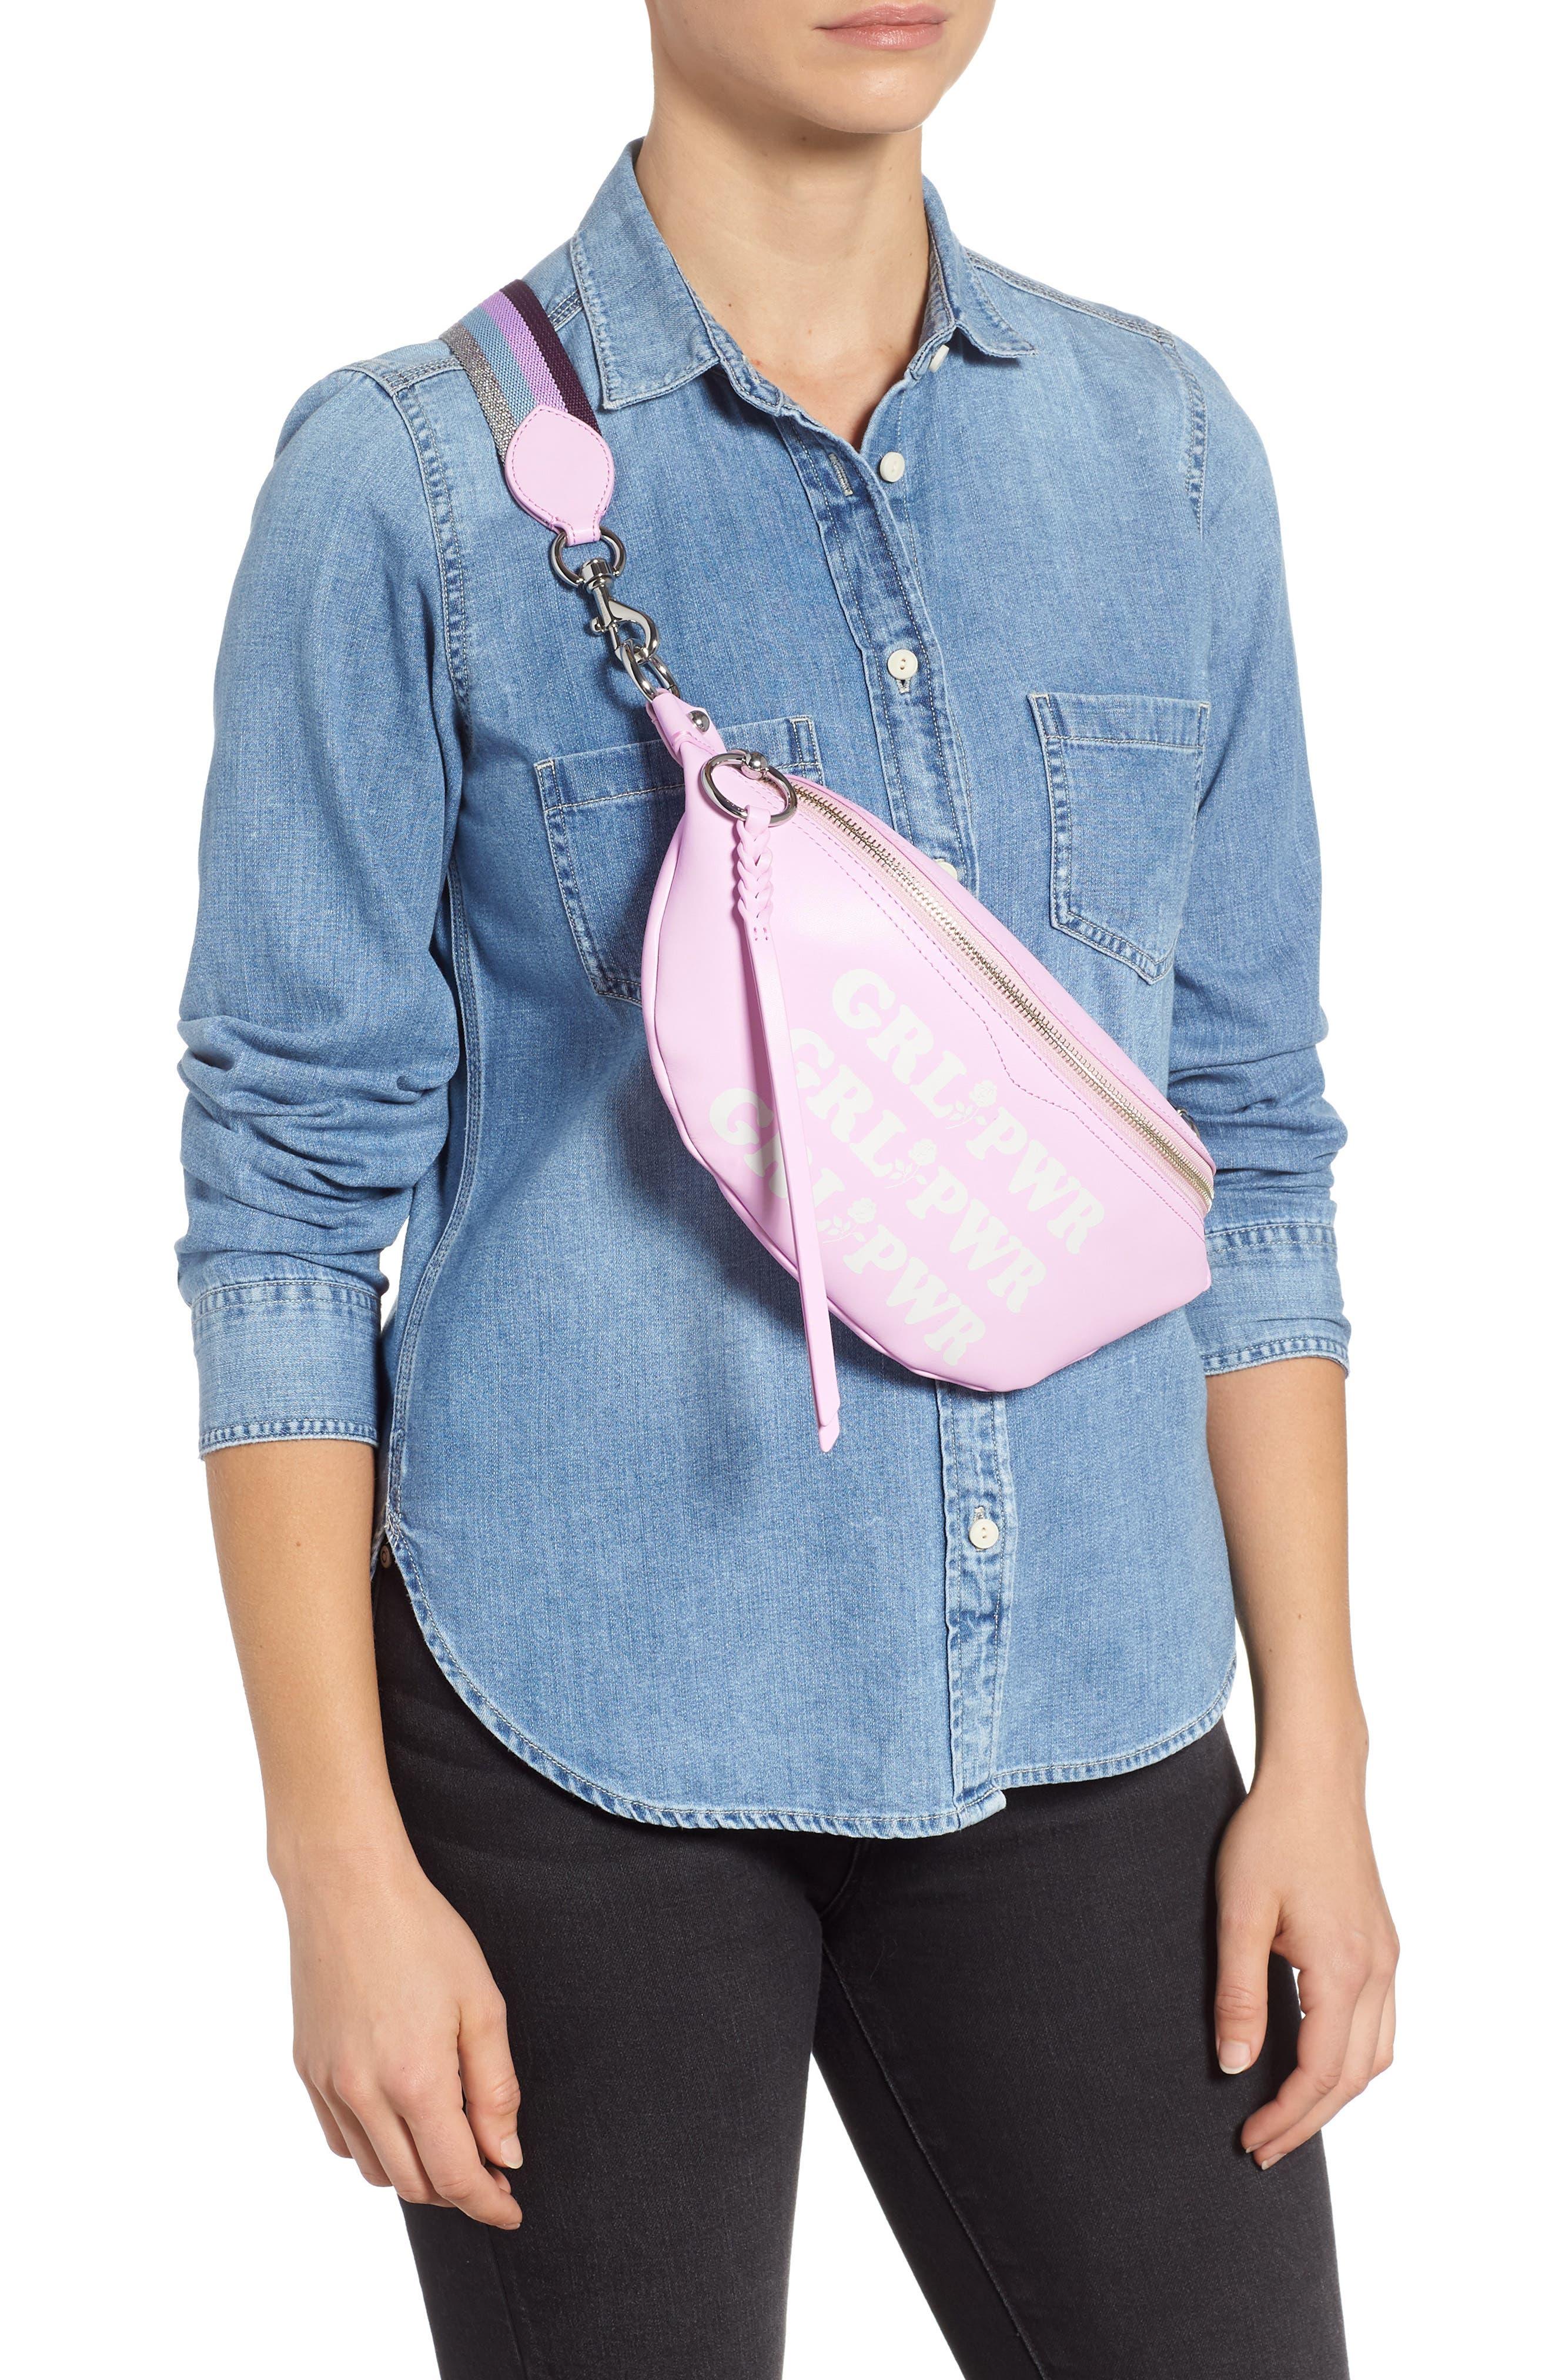 REBECCA MINKOFF,                             Bree - GRL PWR Leather Belt Bag,                             Alternate thumbnail 3, color,                             500